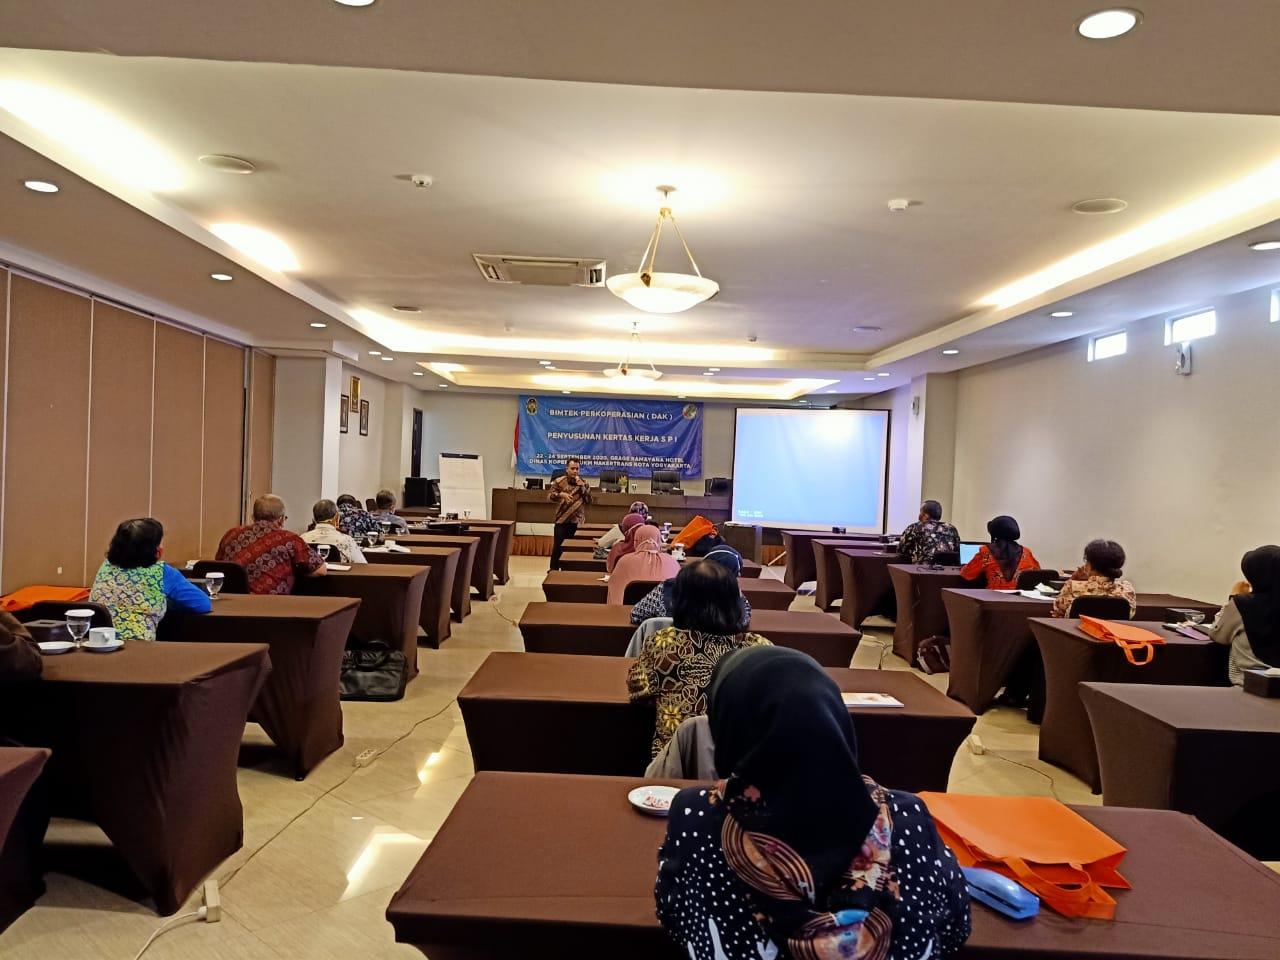 BIMTEK PELATIHAN PENYUSUNAN SISTEM PENGENDALIAN INTERNAL (SPI) TGL 22 SEPTEMBER - 24 SEPTEMBER 2020 DI HOTEL GRAGE RAMAYANA